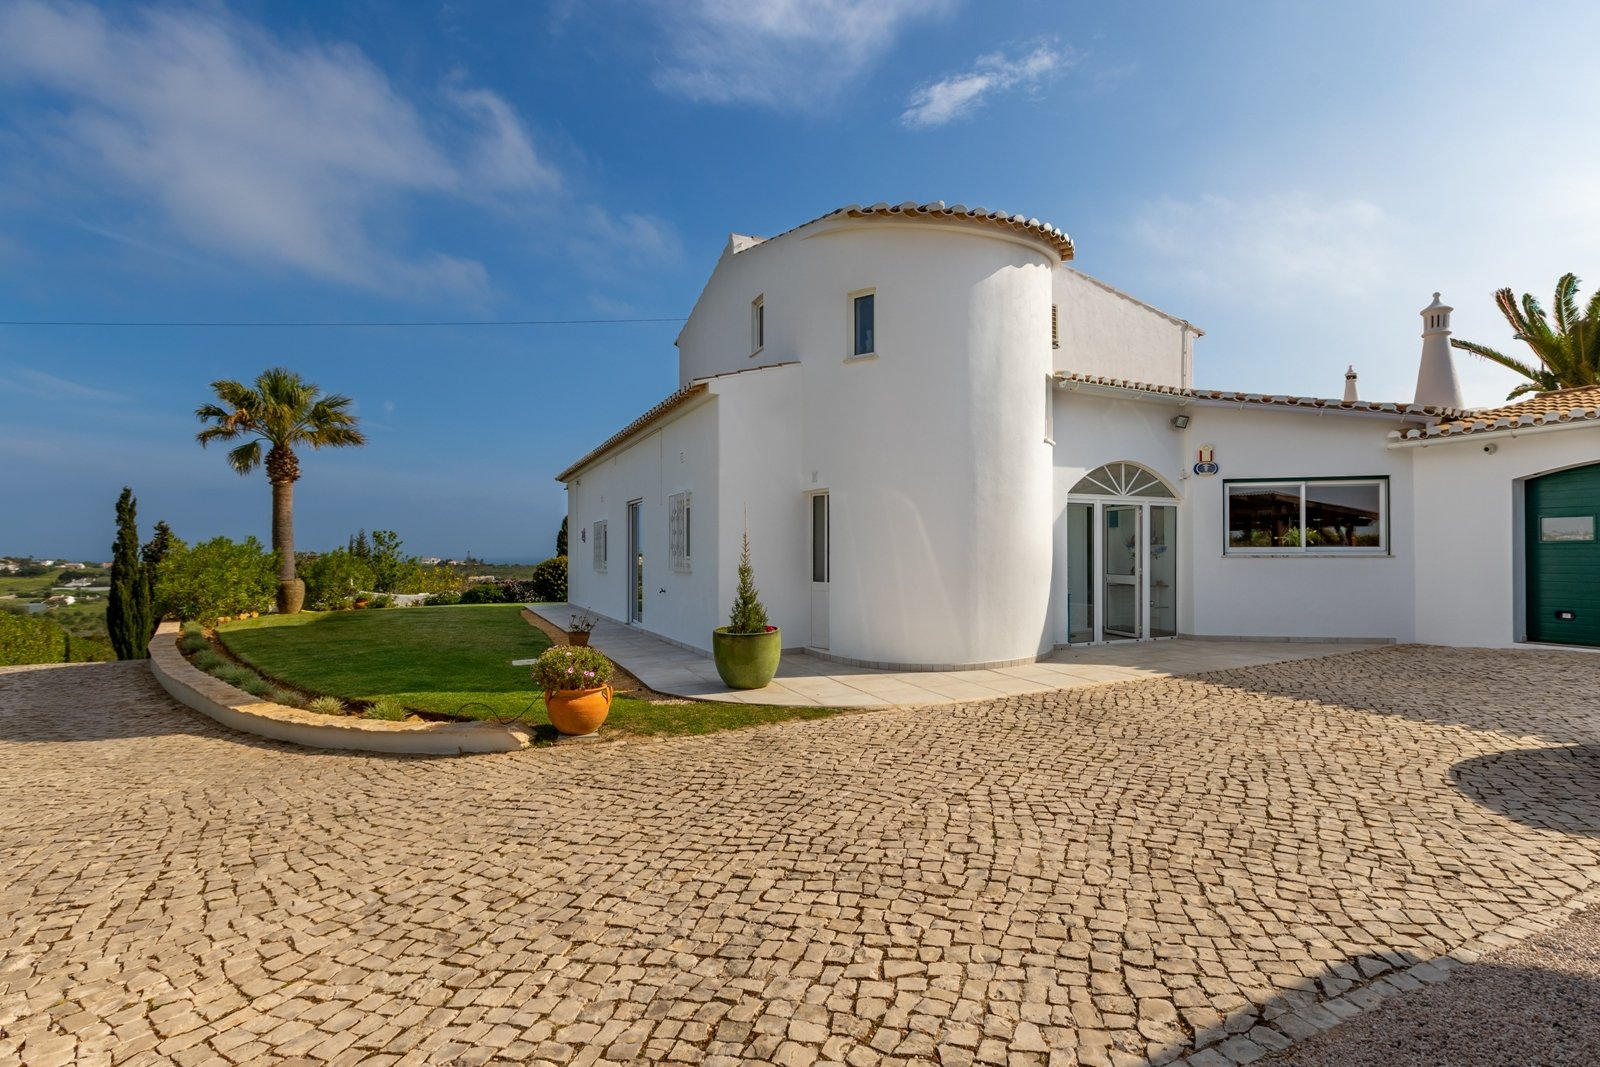 4 Bedroom Villa Praia da Luz, Western Algarve Ref: GV544